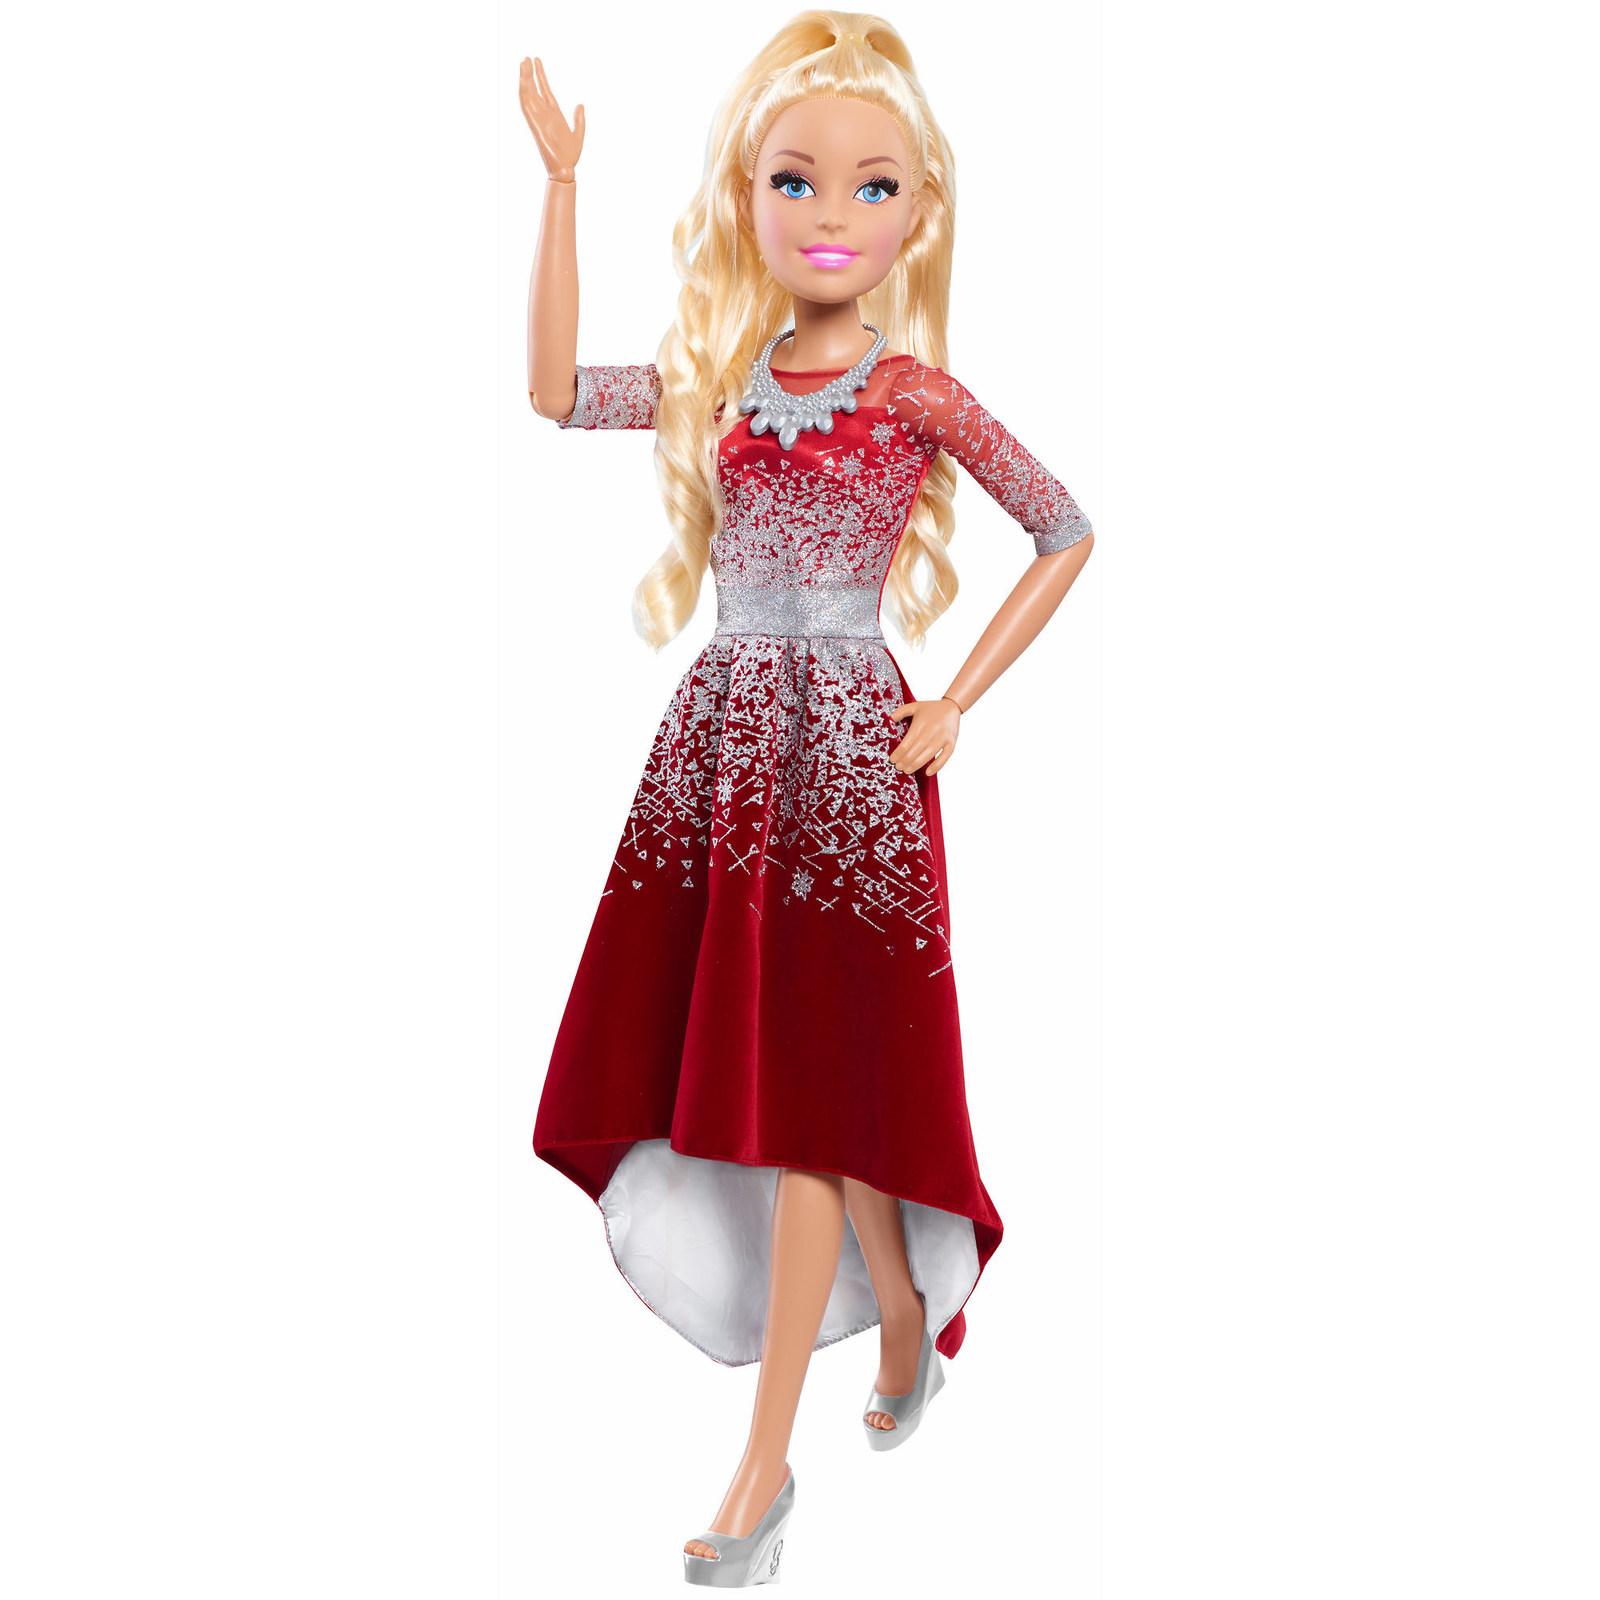 Barbie-Best-Fashion-Friend-28inch-Holiday-Doll-Blonde-BJs Wholesale Club